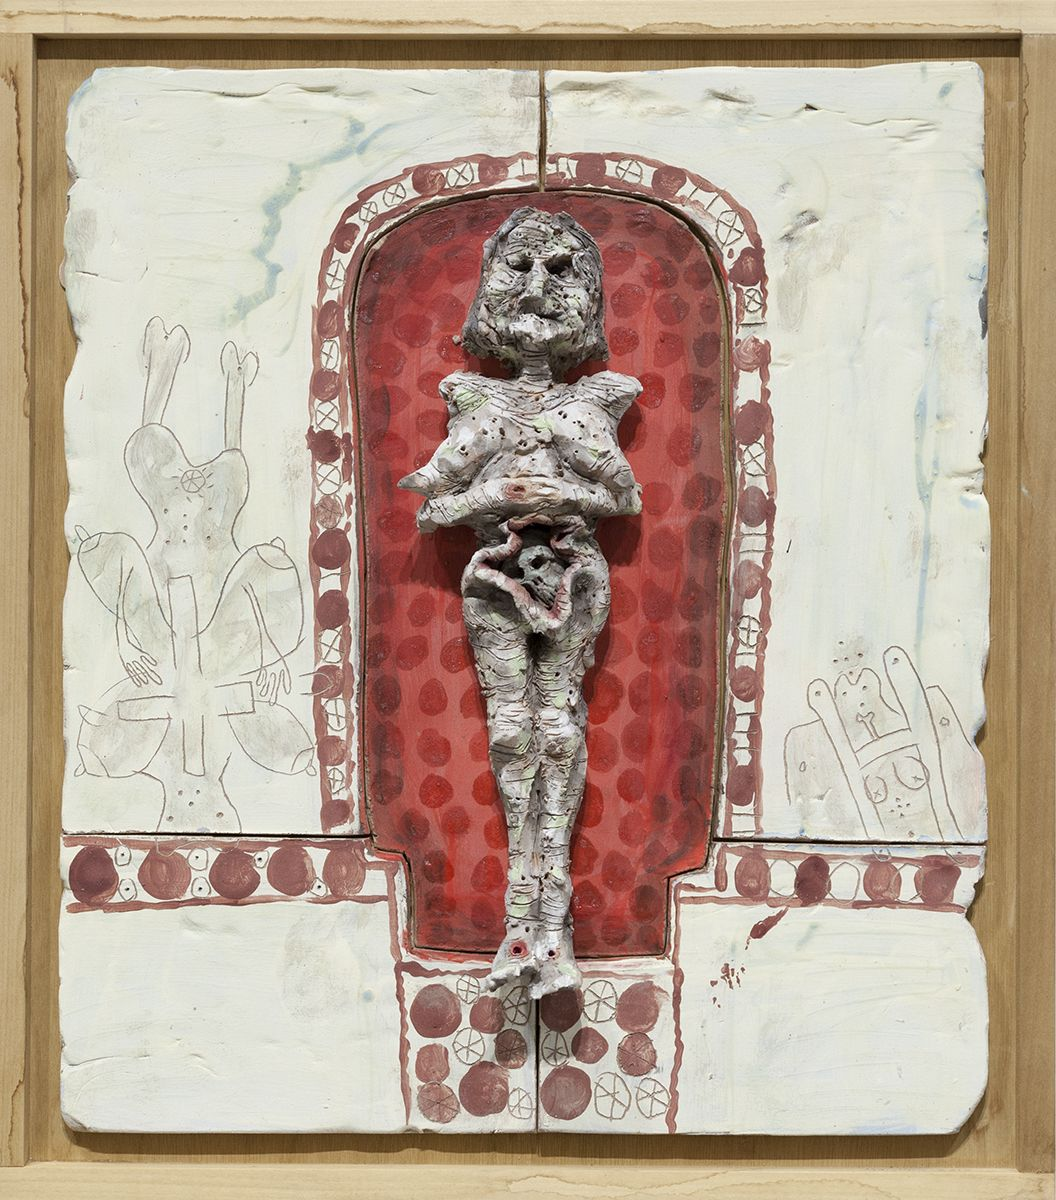 Richard Hawkins  Norogachian Prostitute Priestess of the Sun, 2016  Glazed ceramic in artist's frame   22 3/4 x 25 3/4 x 4 1/2 inches (57.8 x 65.4 x 11.4 cm)